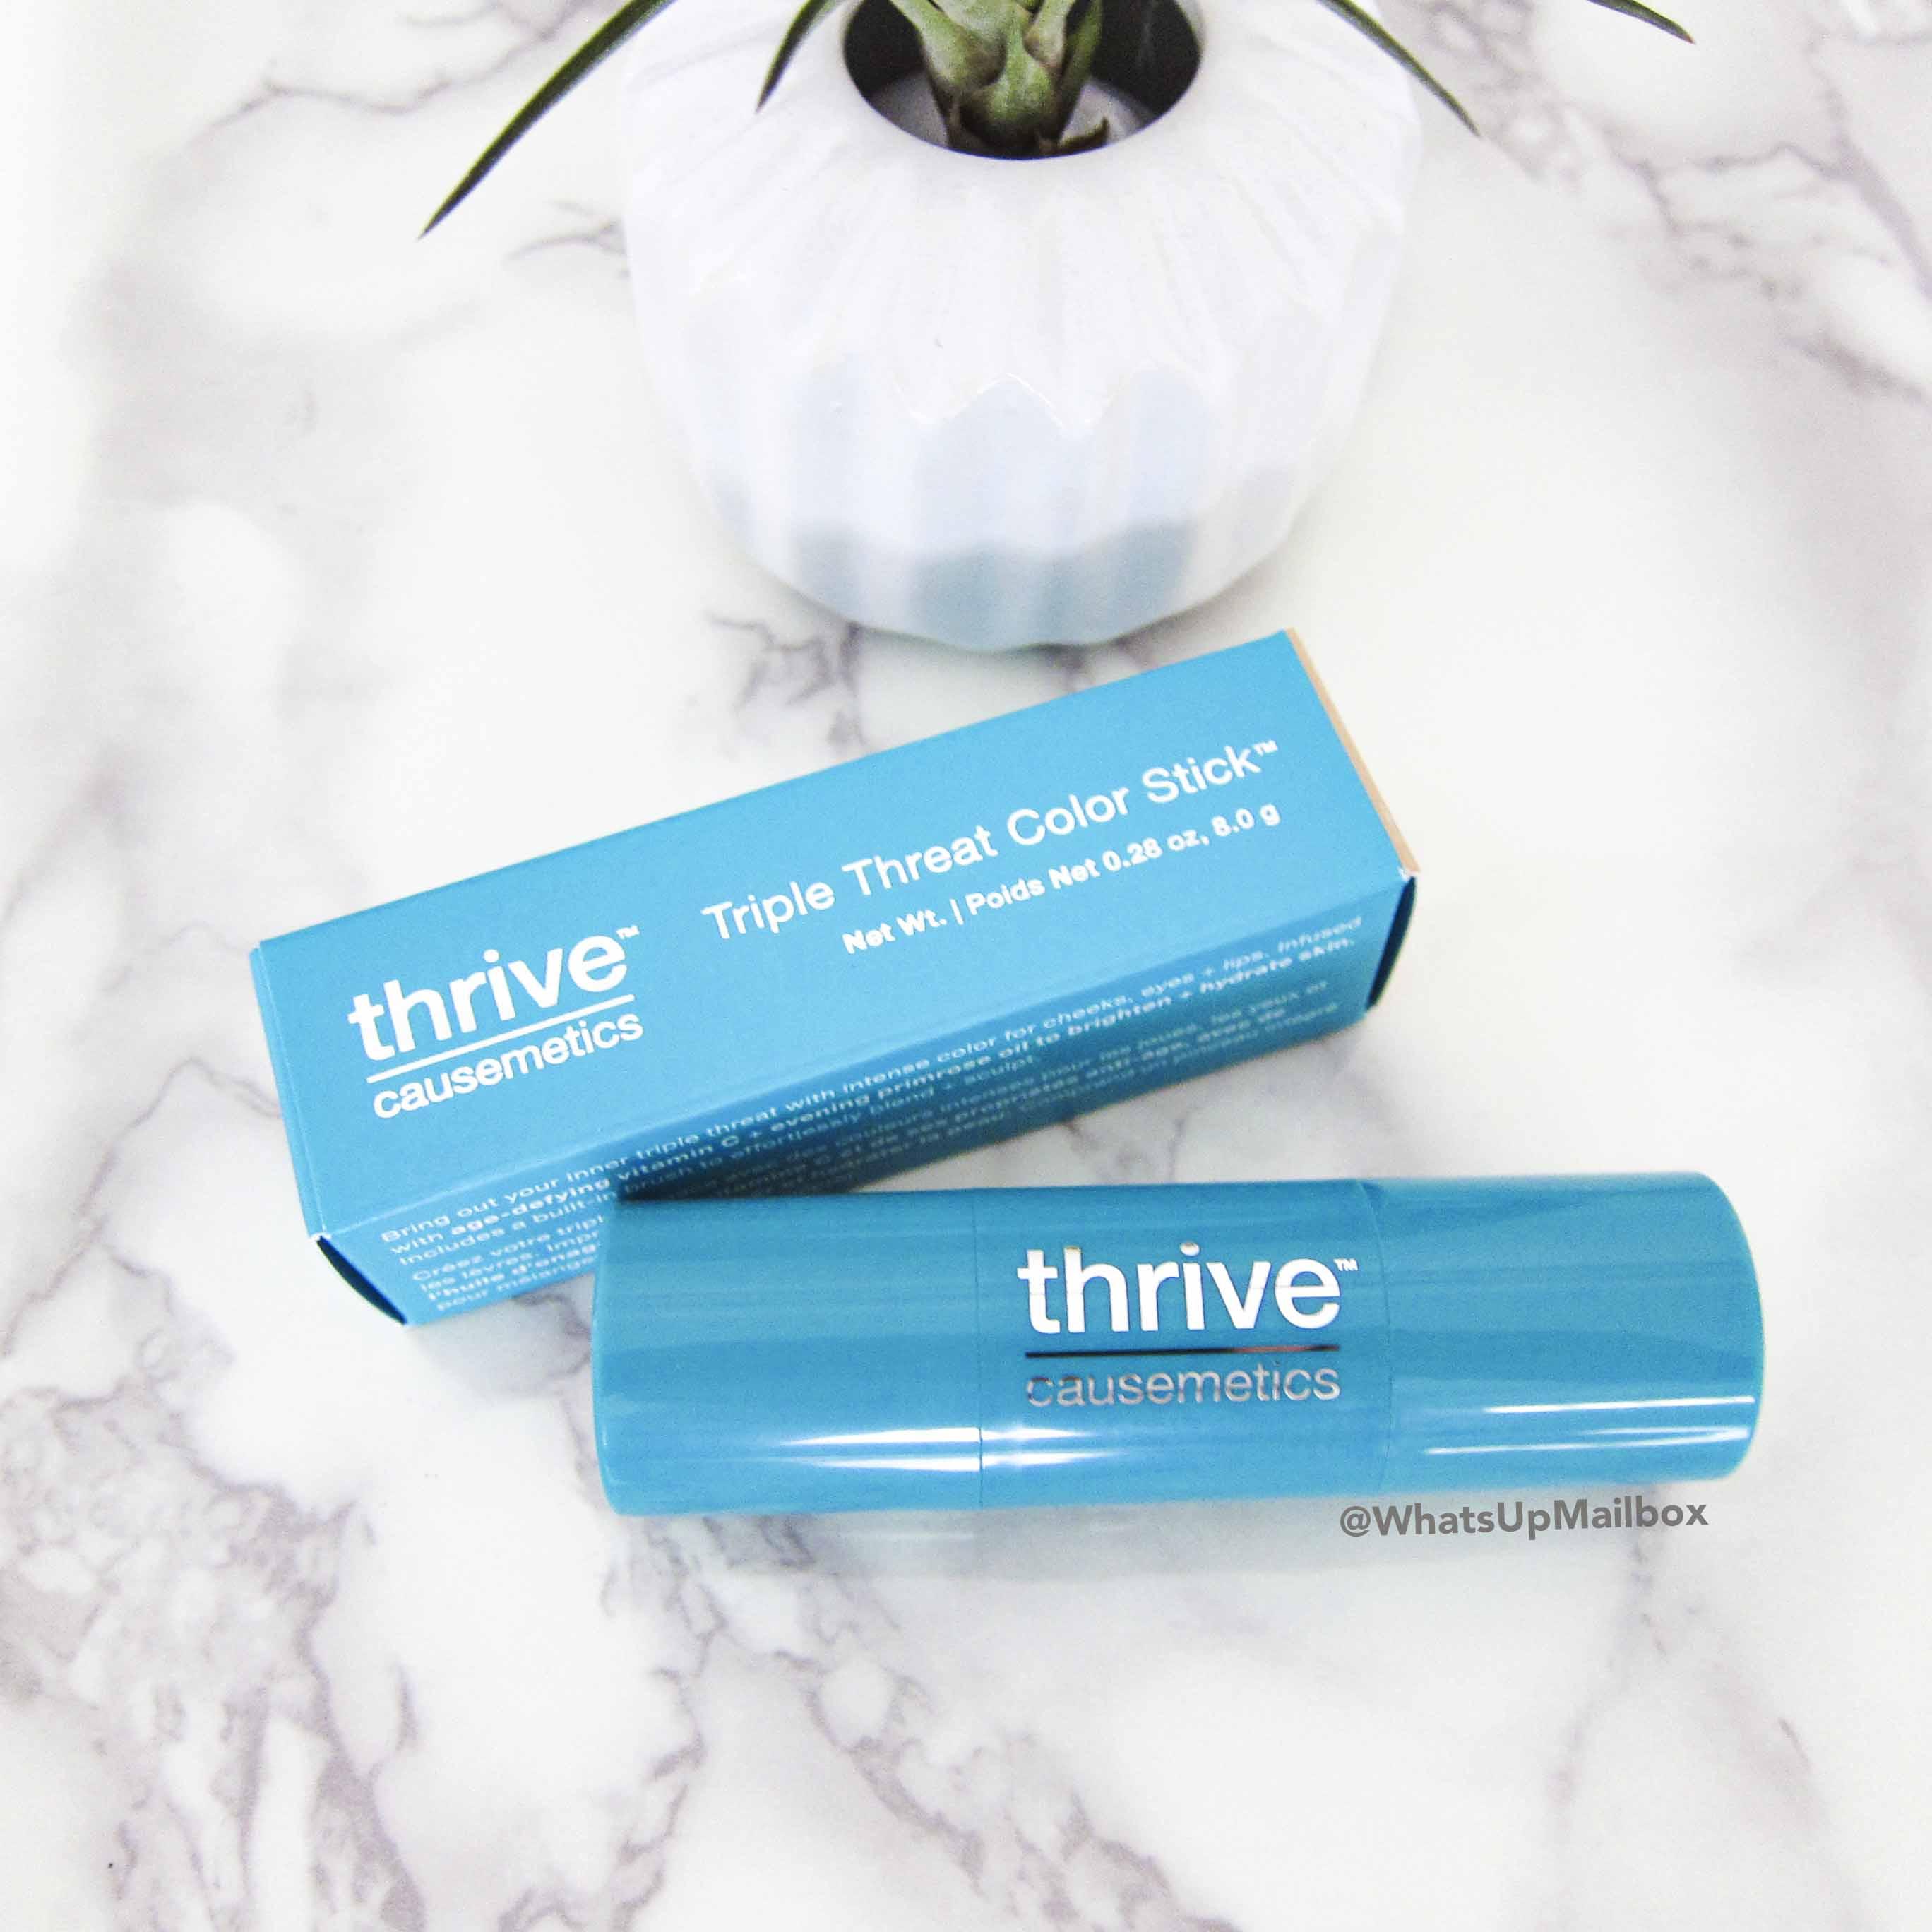 Thrive Causemetics Triple Threat Color Stick in Joy